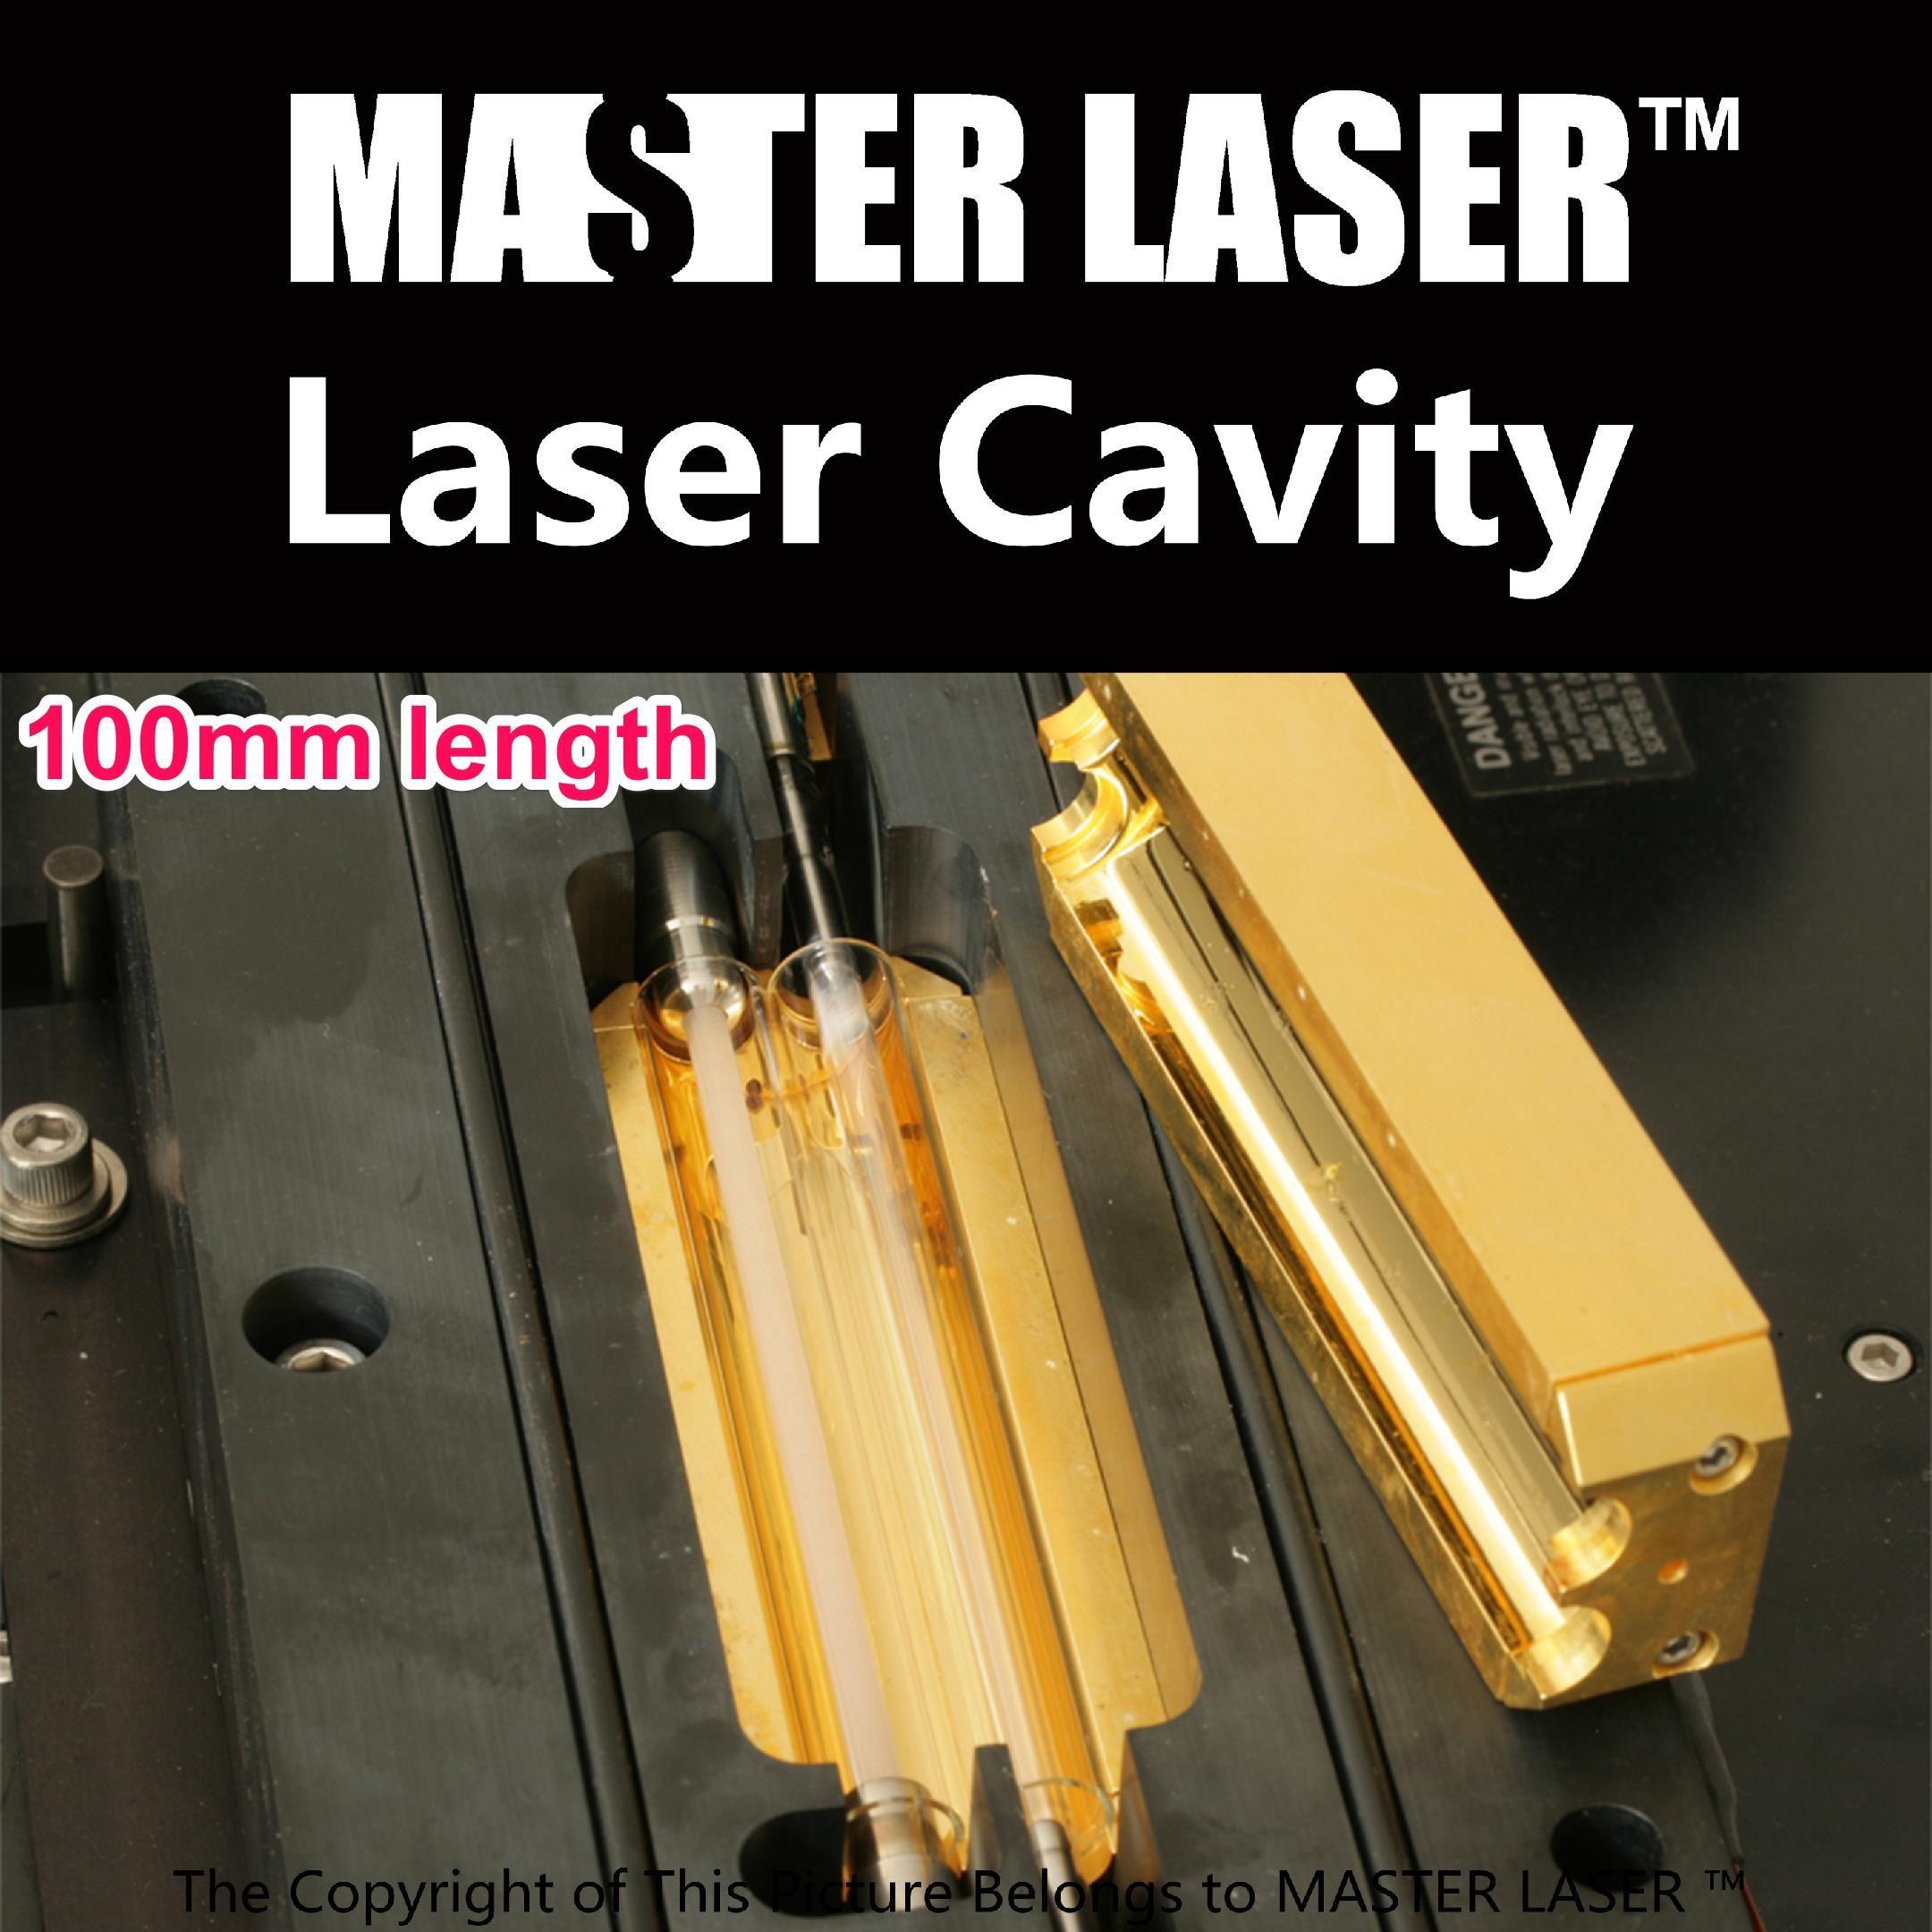 Replace Of Yag Laser Tag Equipment Laser Welding Machine Yag Marking Machine Laser Cavity Golden Chamber Body Length 100 Laser Welding Welding Machine Cavities